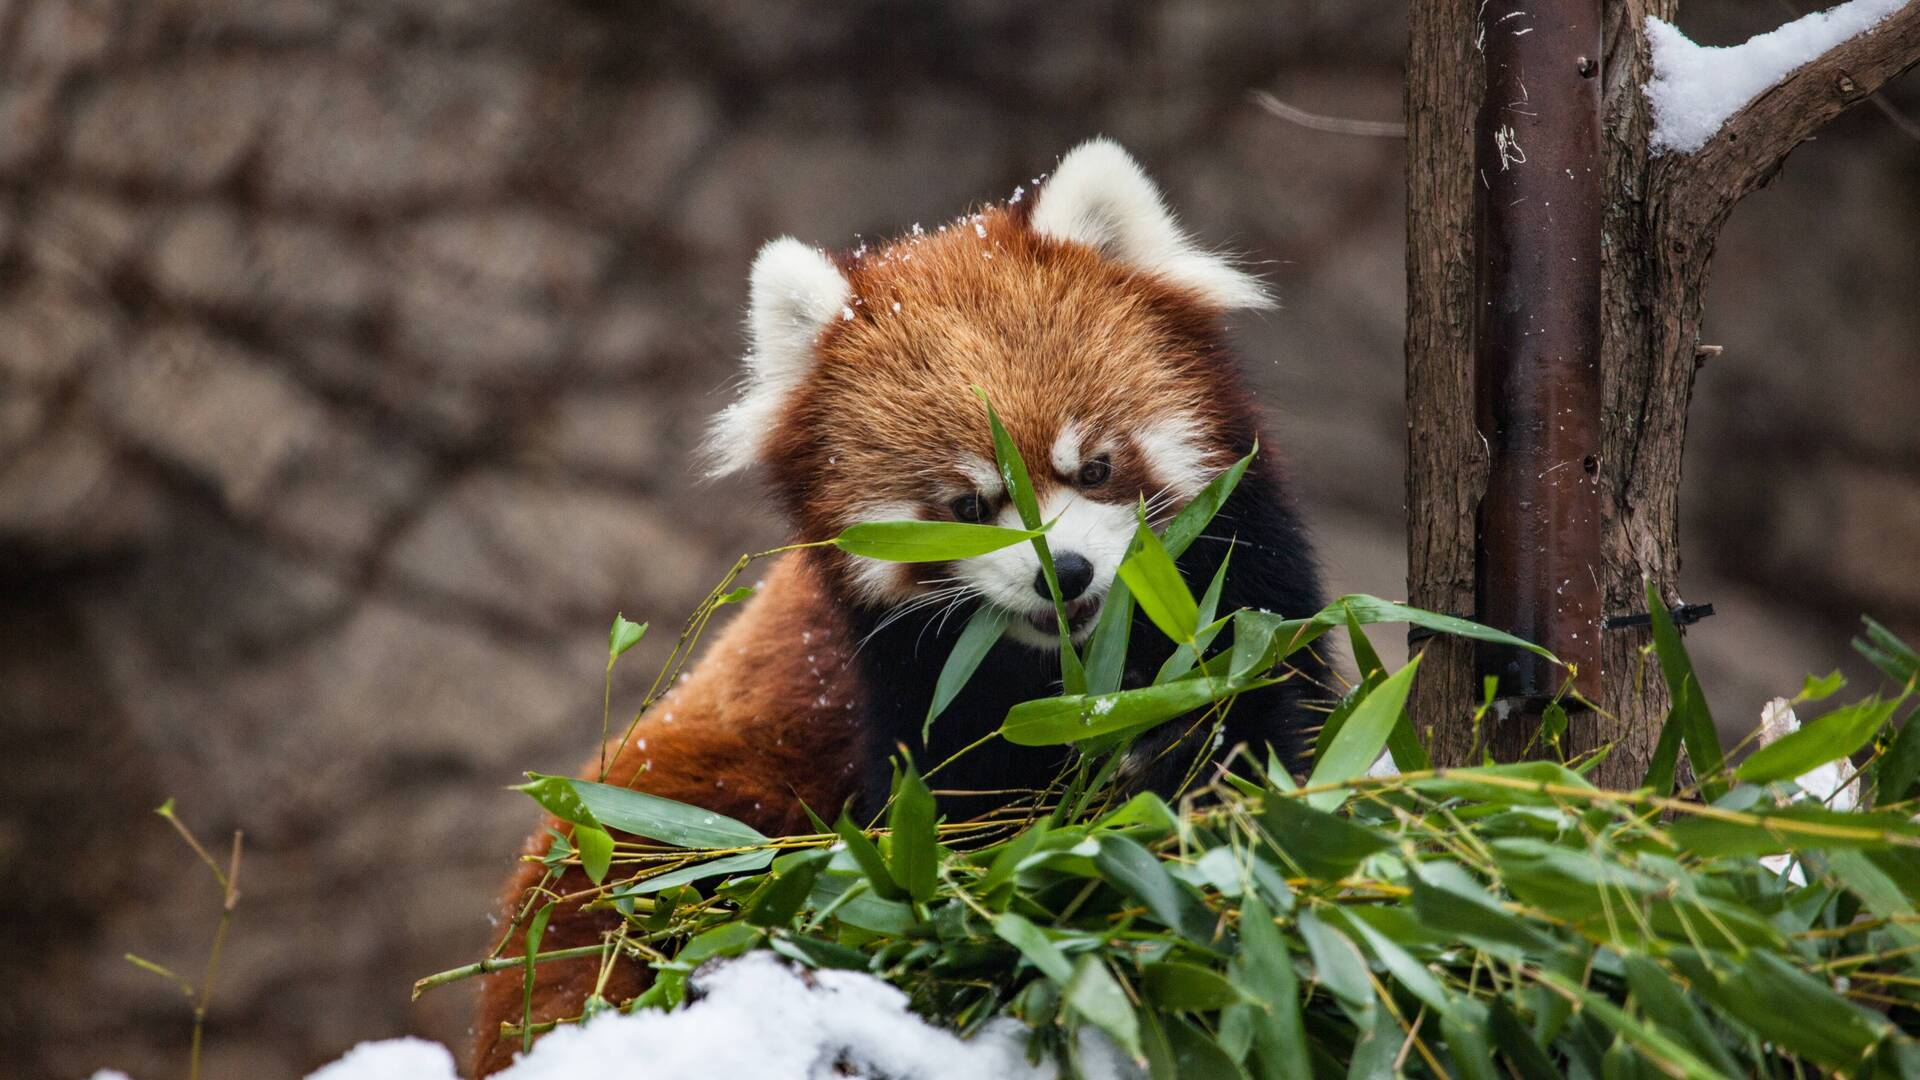 1920x1080 Red Panda Laptop Full HD 1080P HD 4k Wallpapers, Images